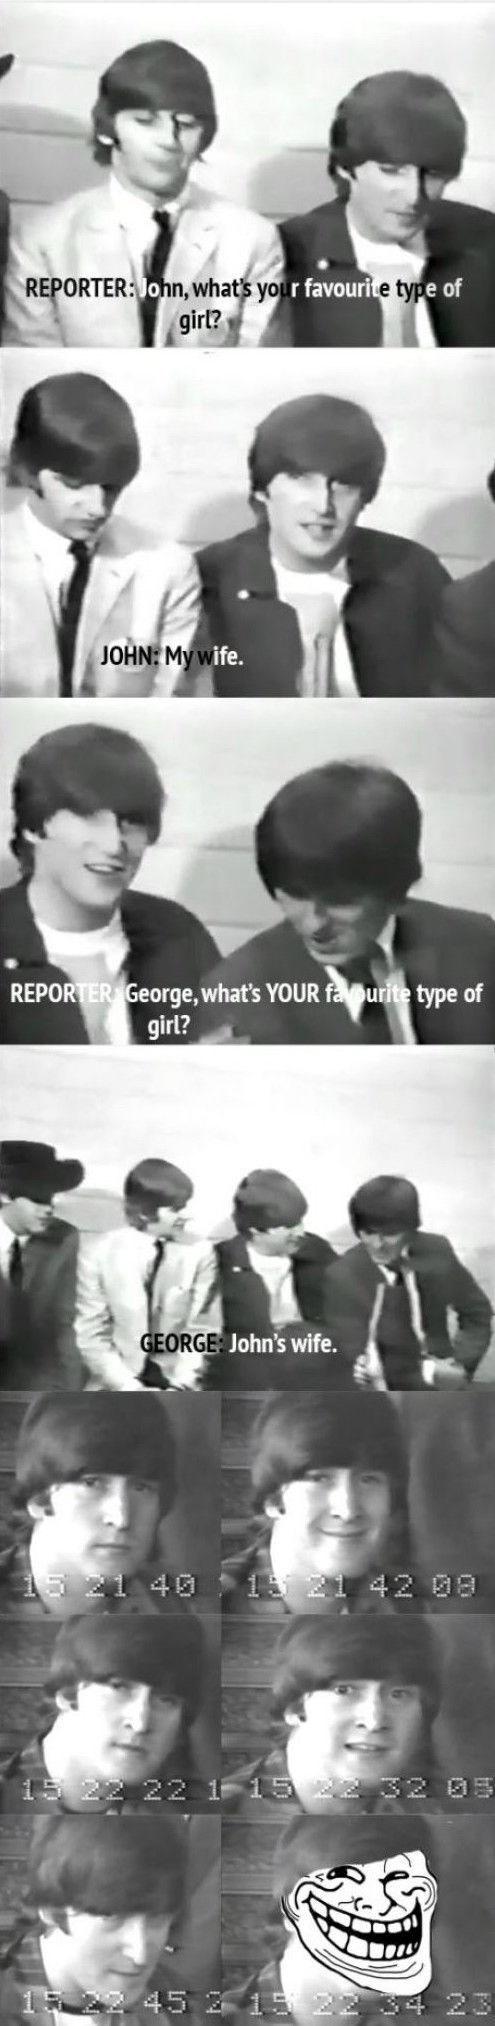 Beatles banter on camera